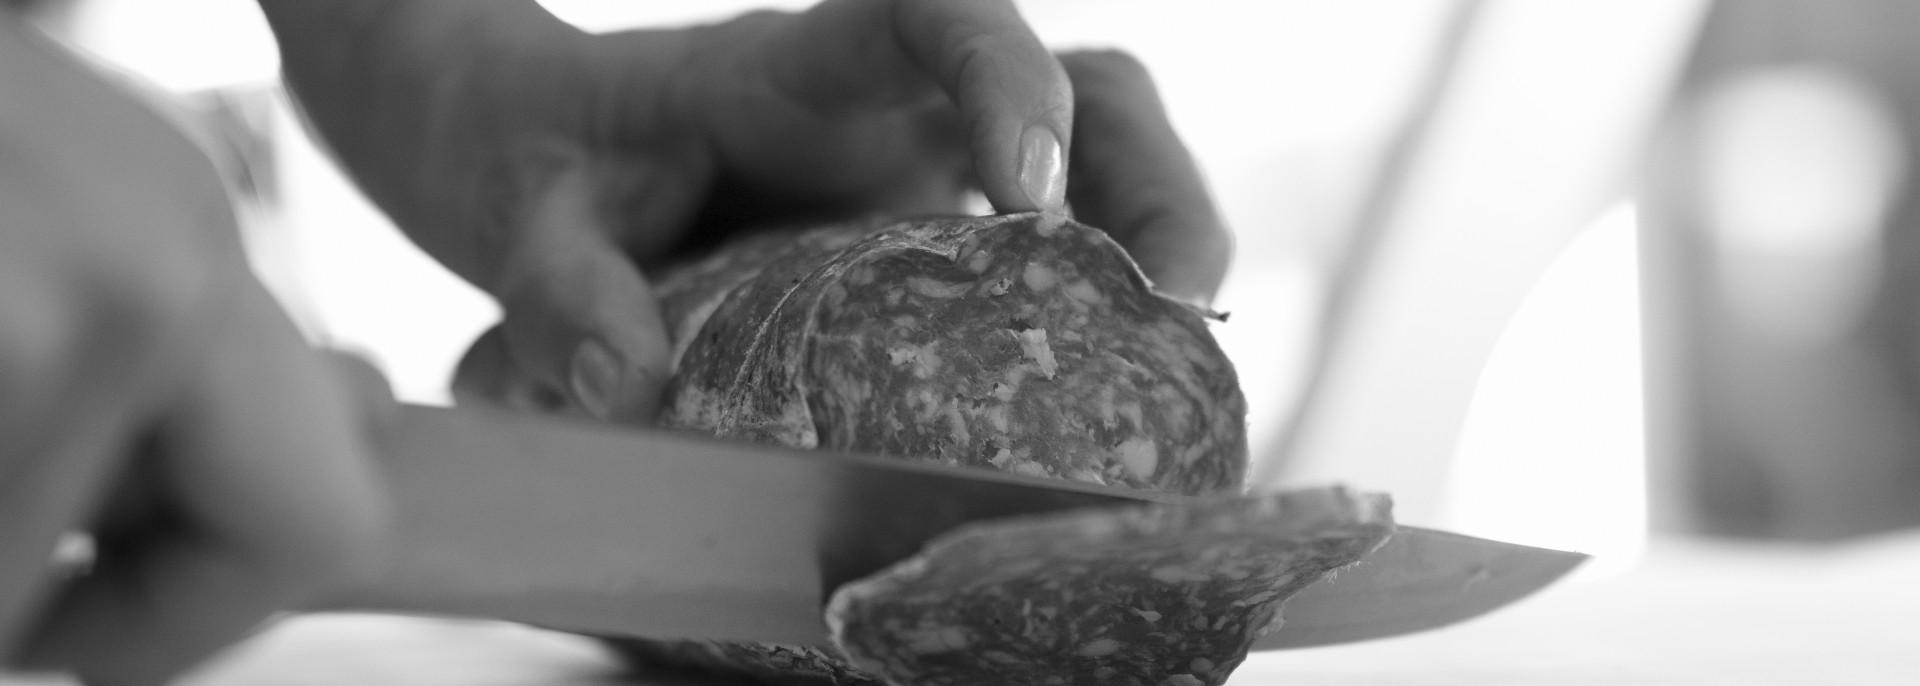 Salame Bonemerse - Formaggi e Salumi d'Italia